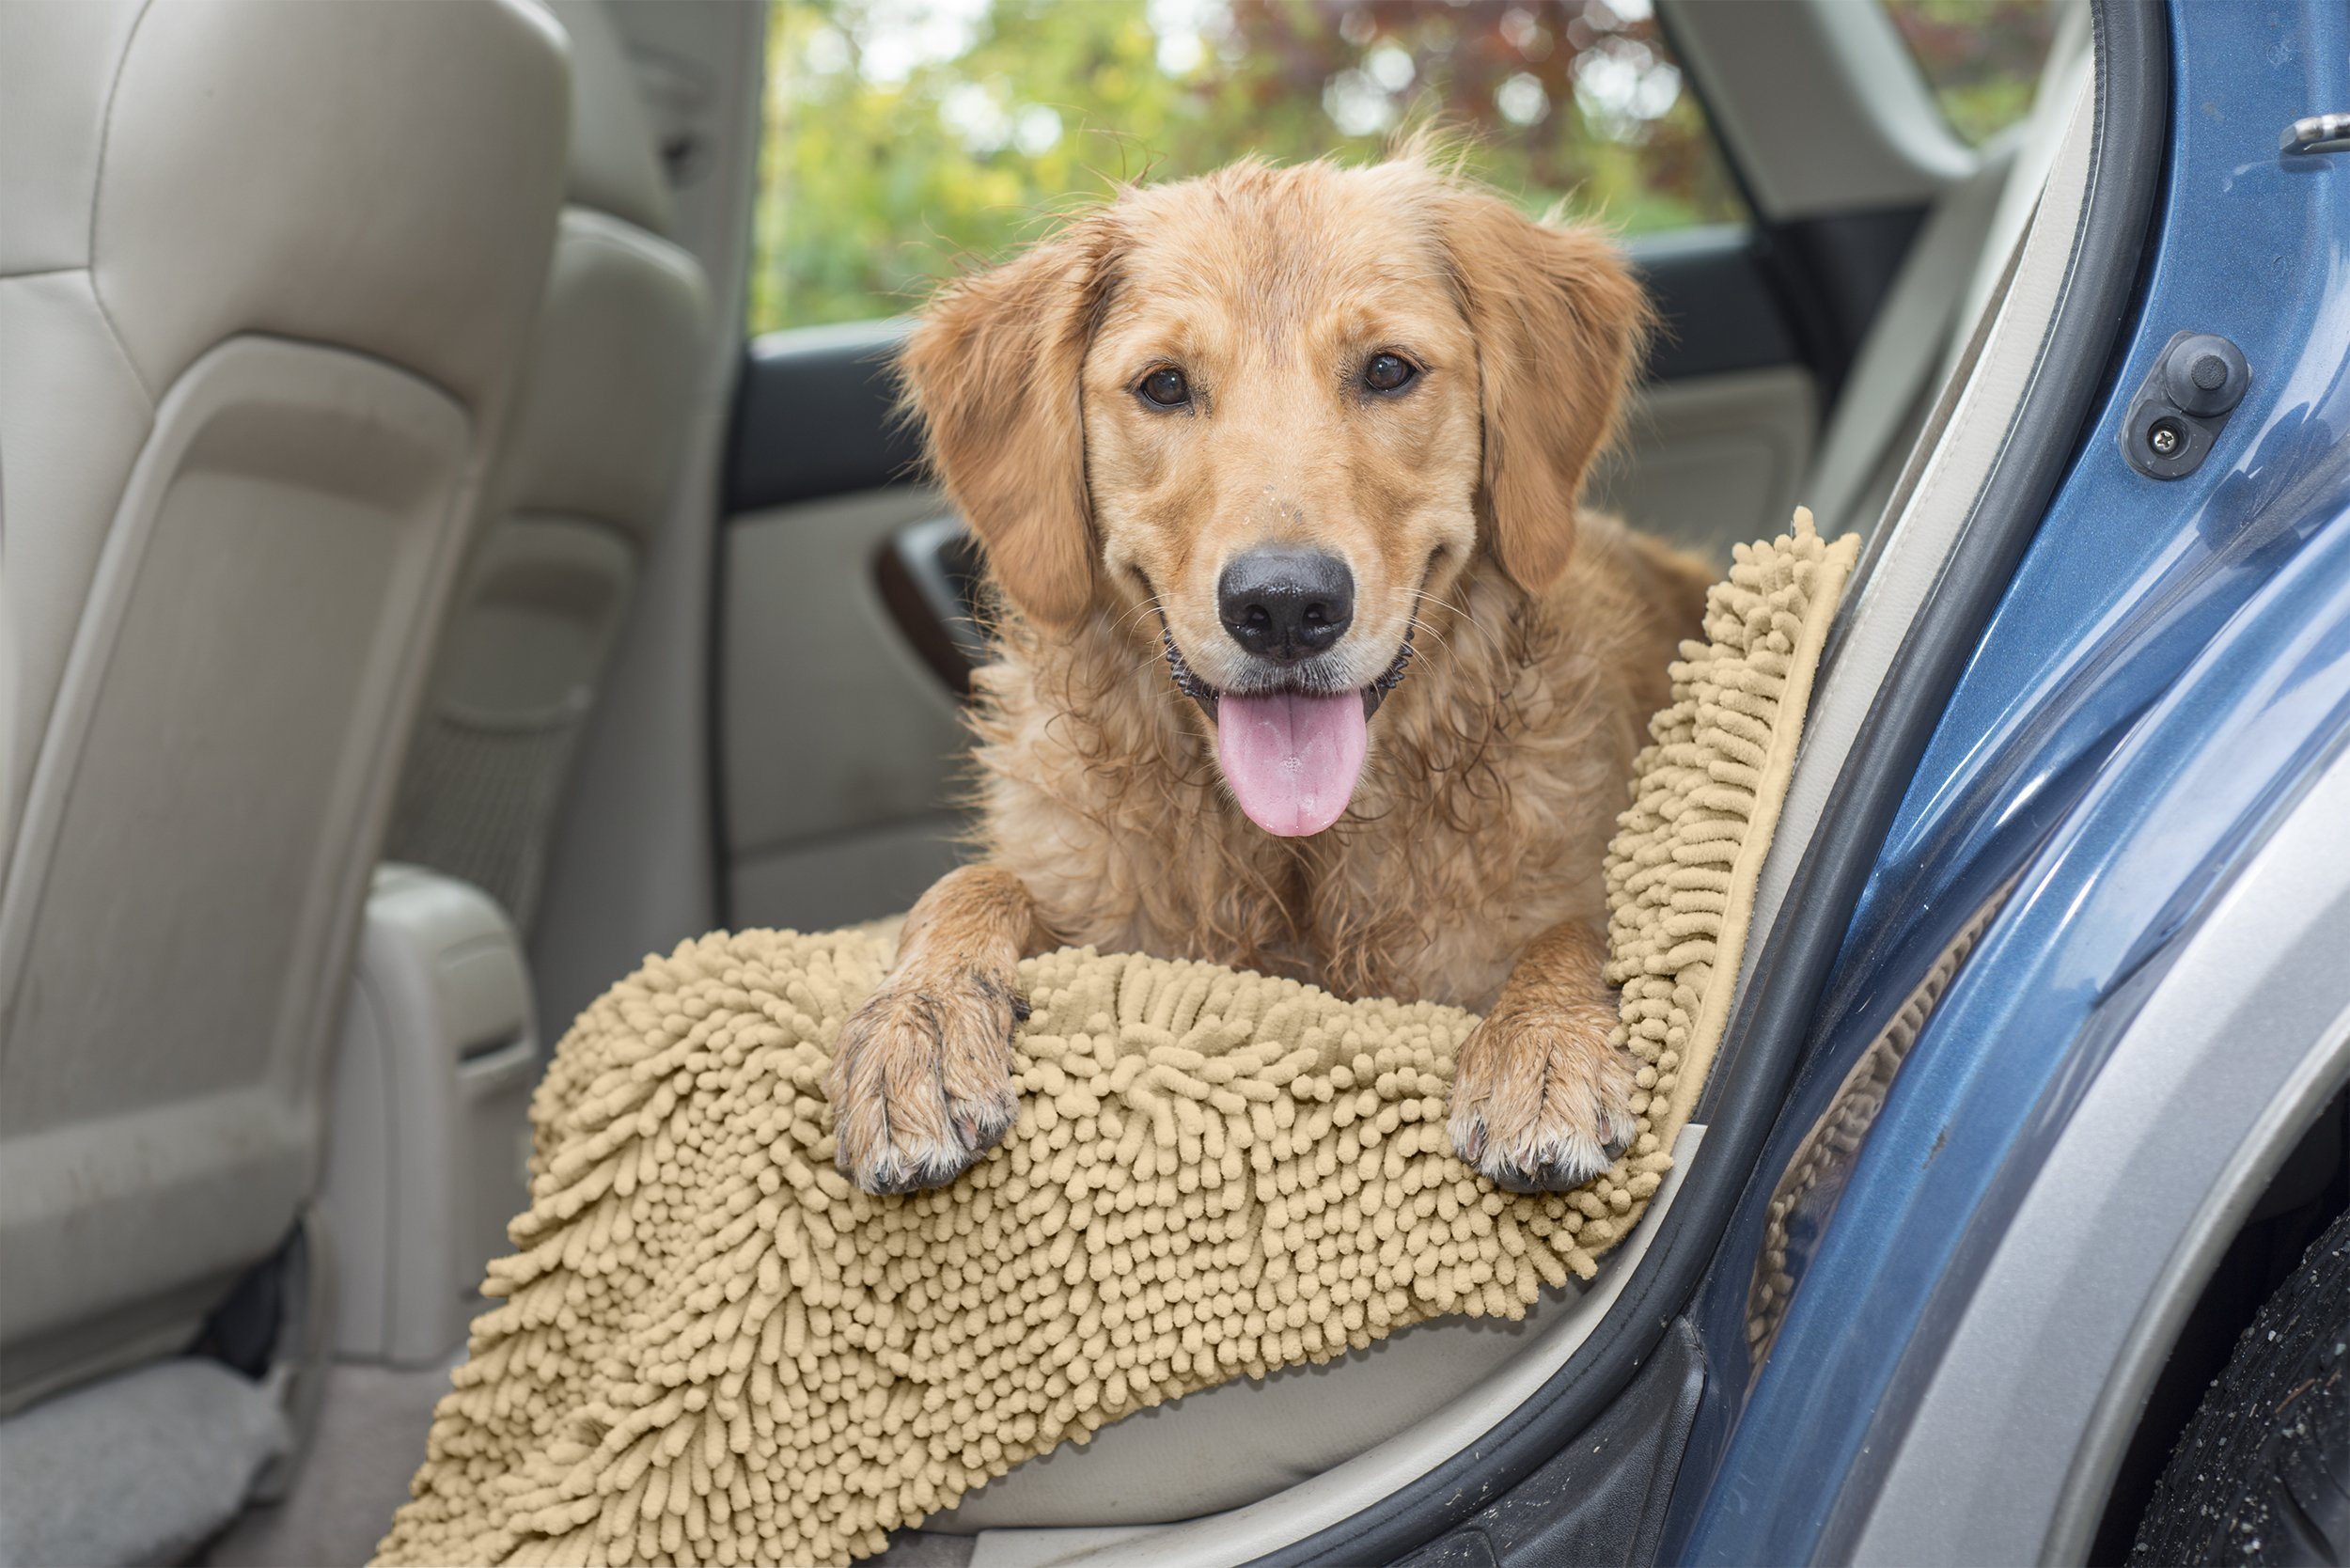 Furhaven Pet 80551613 Runner Muddy Paws Towel & Shammy Rug - Sand by Furhaven Pet (Image #5)